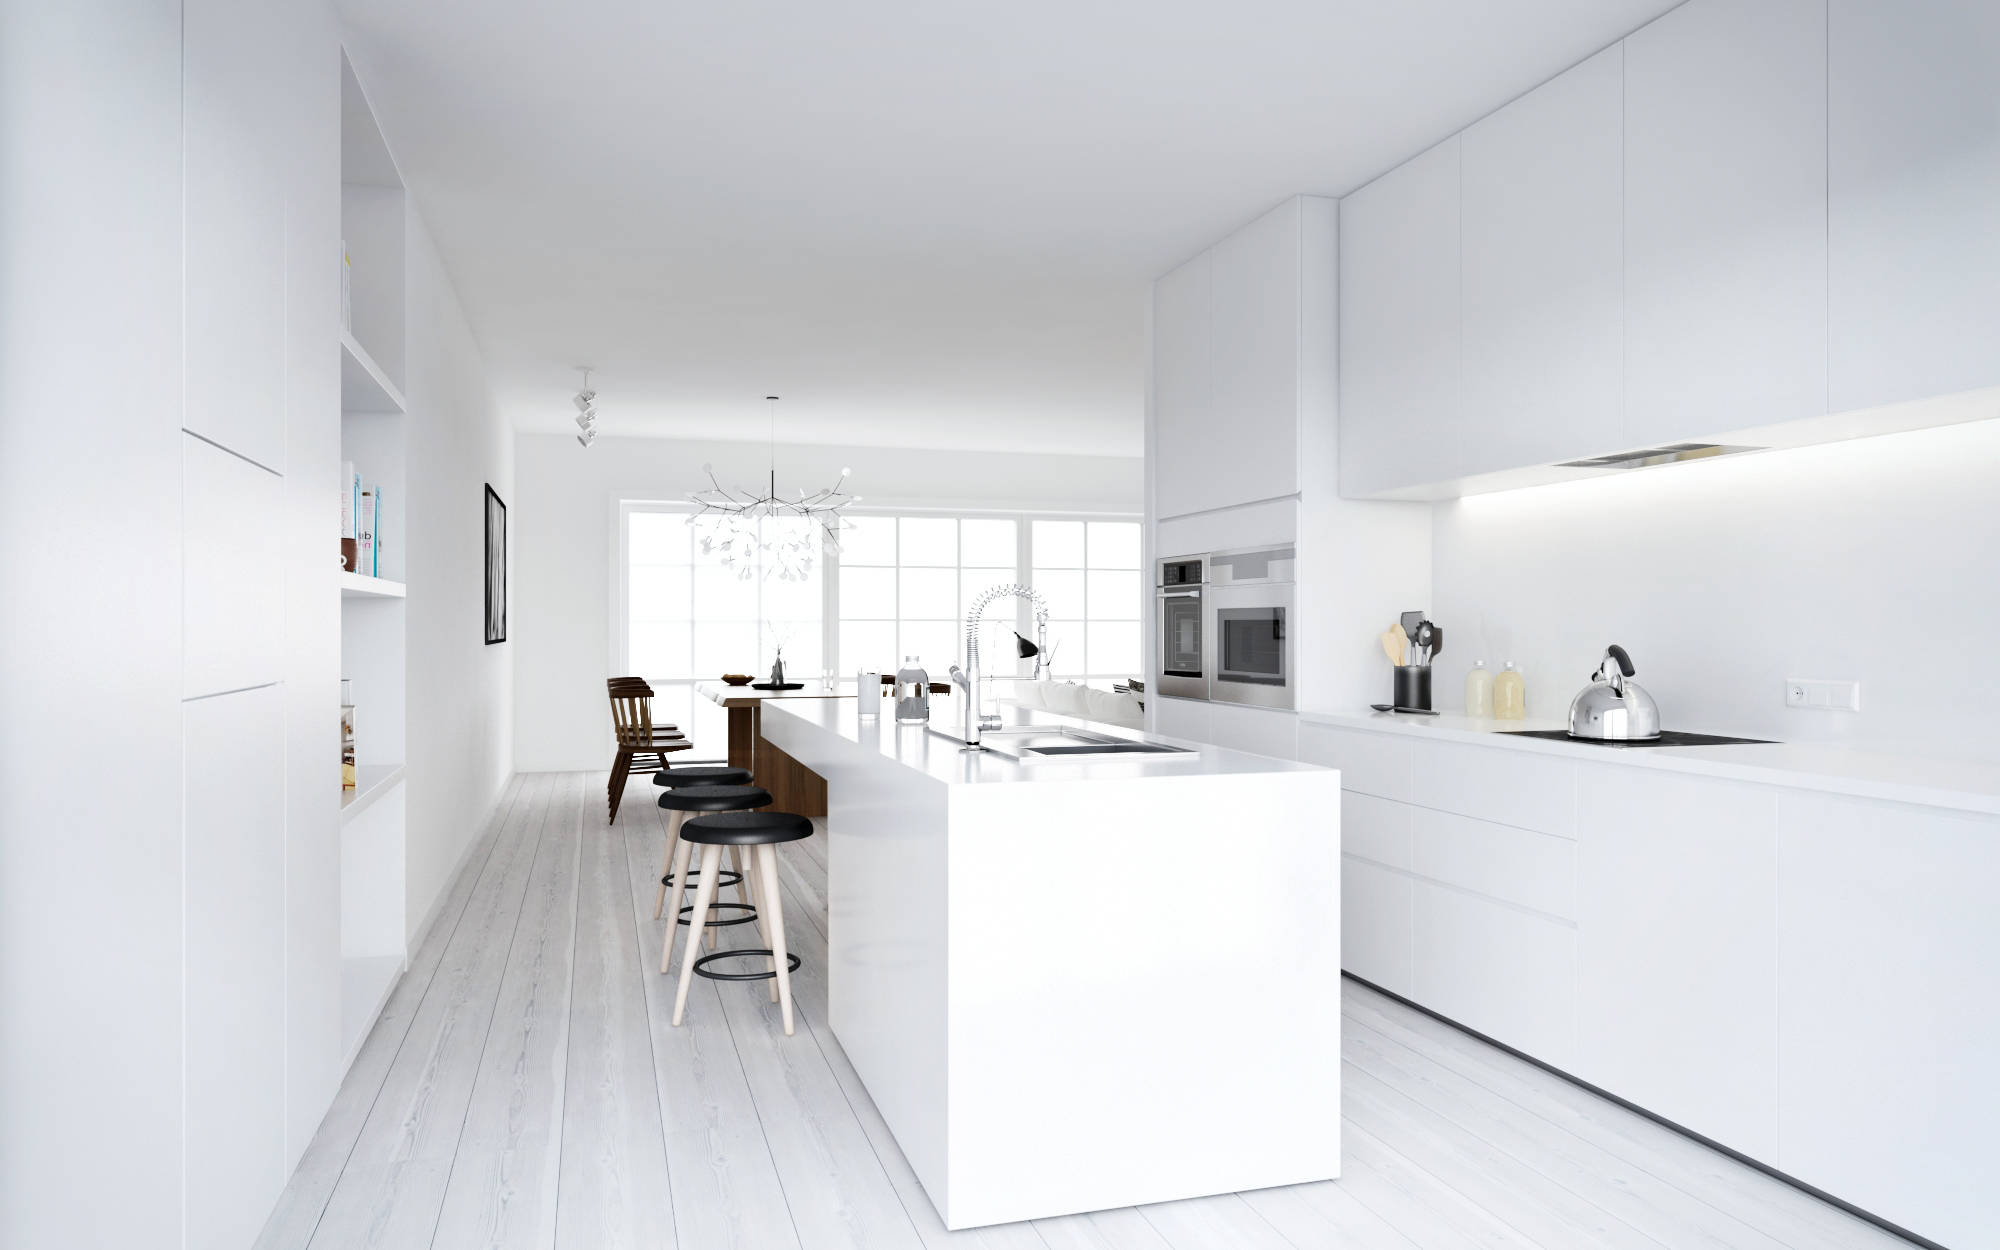 white kitchen decor wooden playsets atdesign nordic style minimalist in